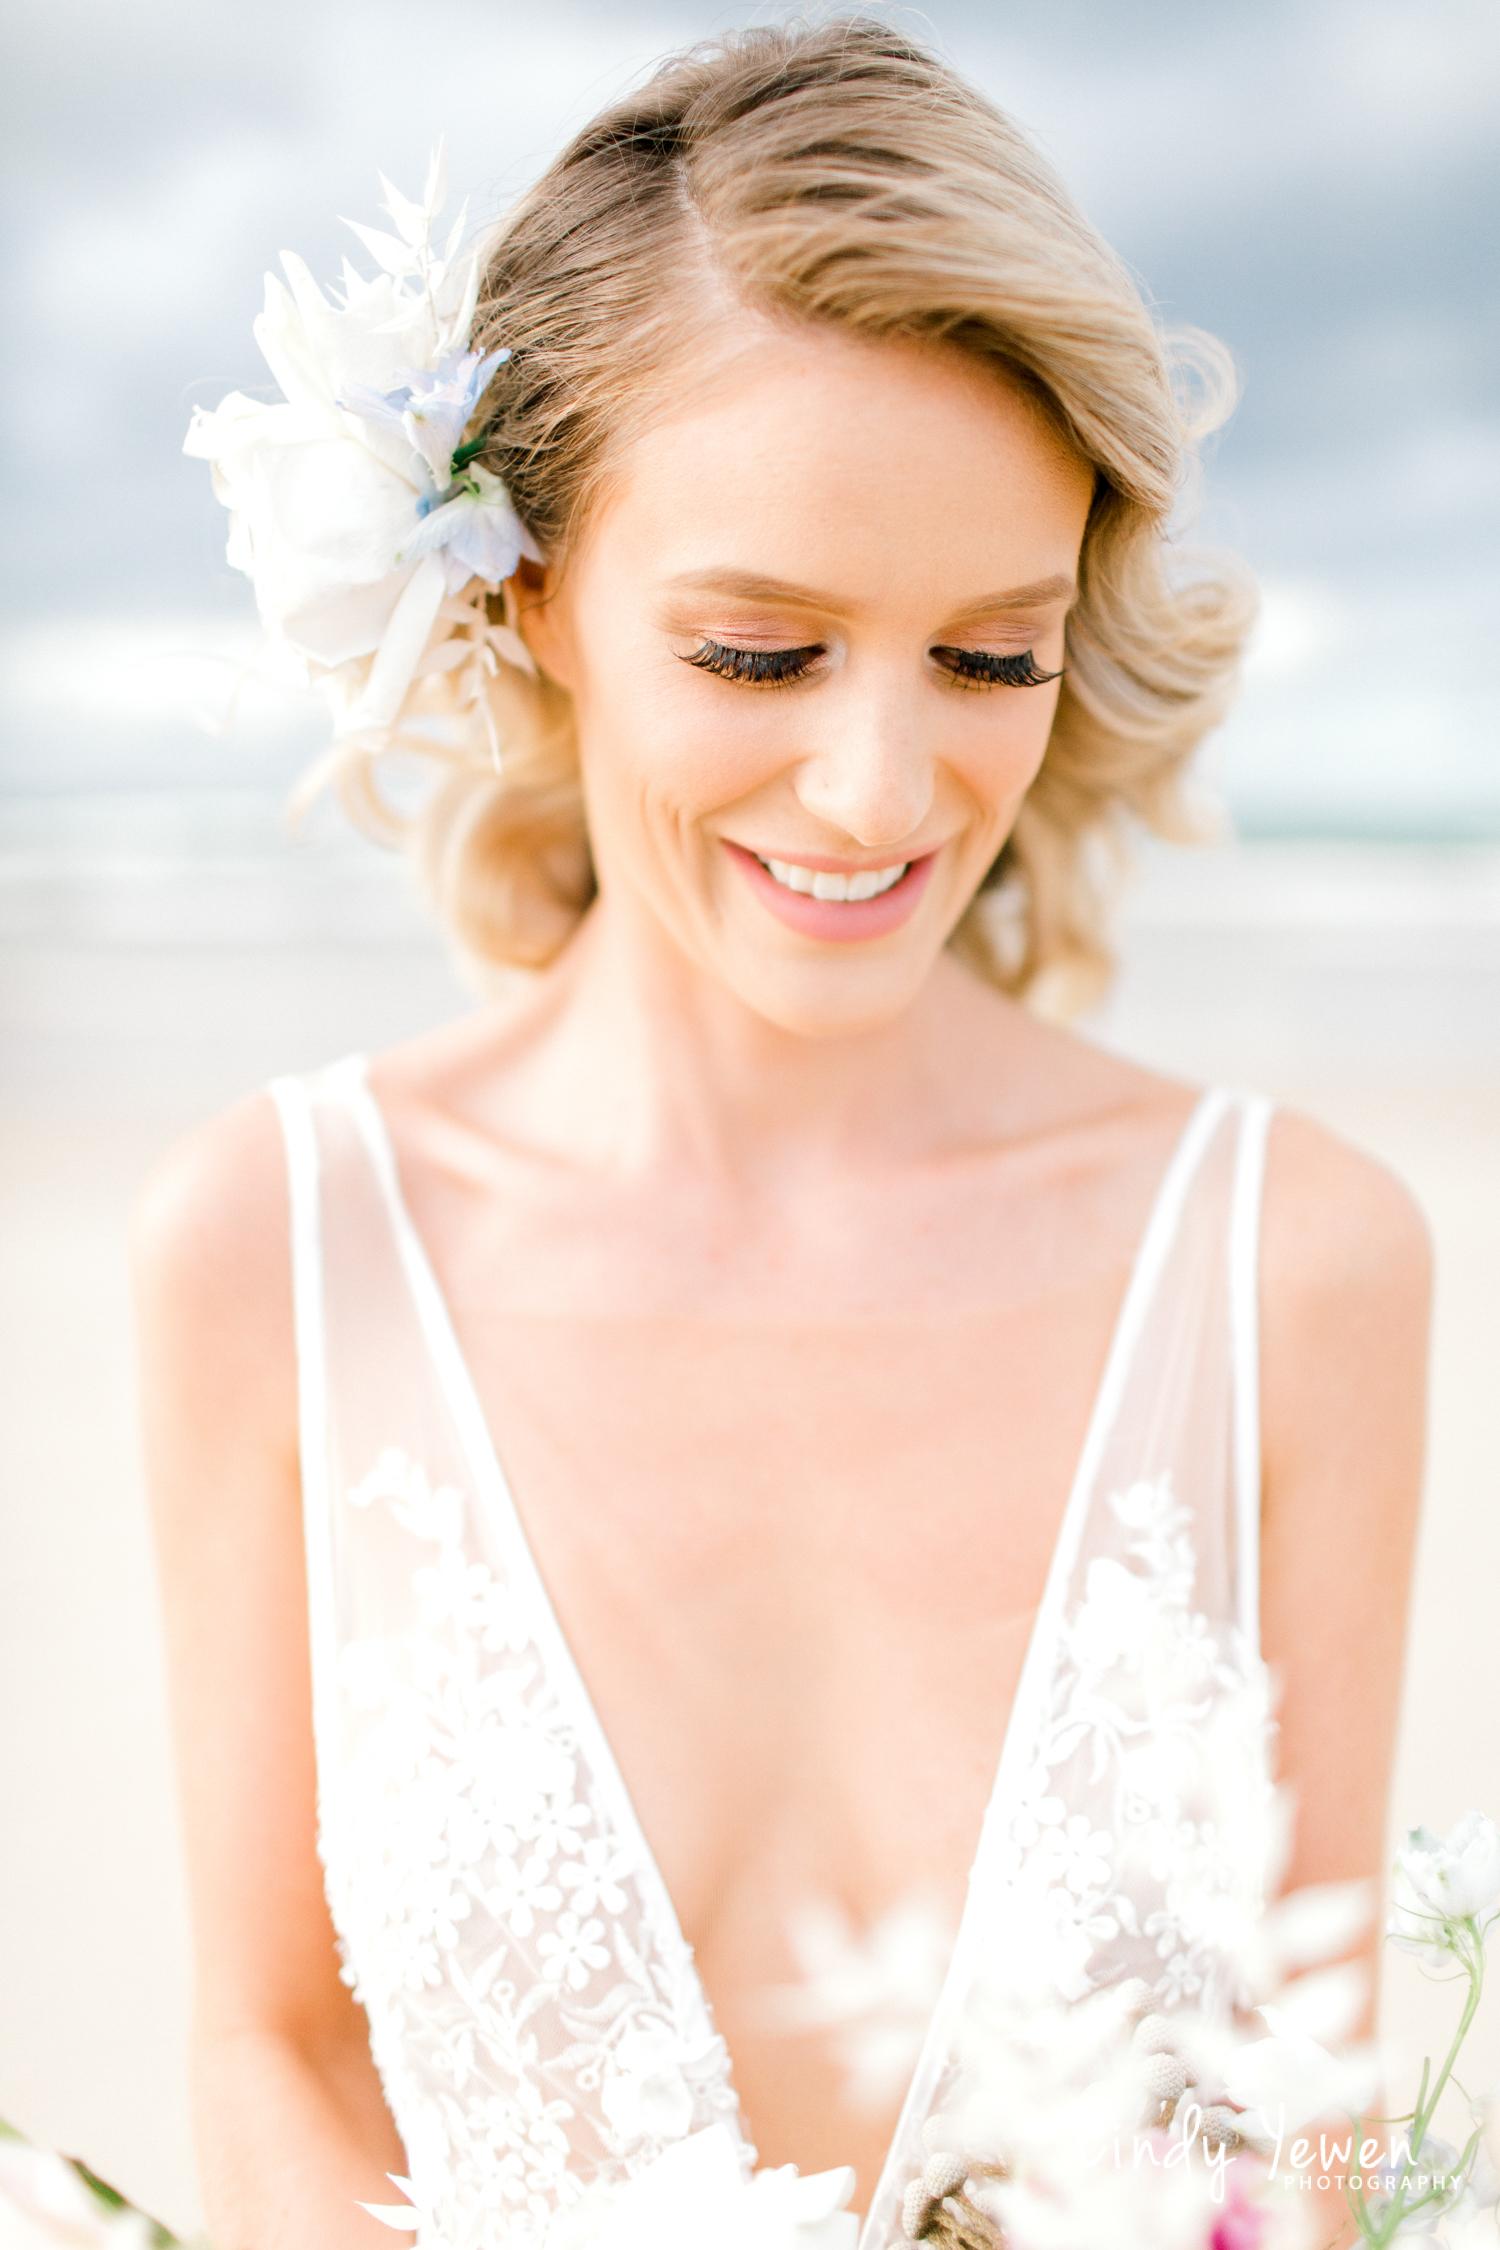 Lindy-Photography-Noosa-Weddings-Grace-Chris 17.jpg